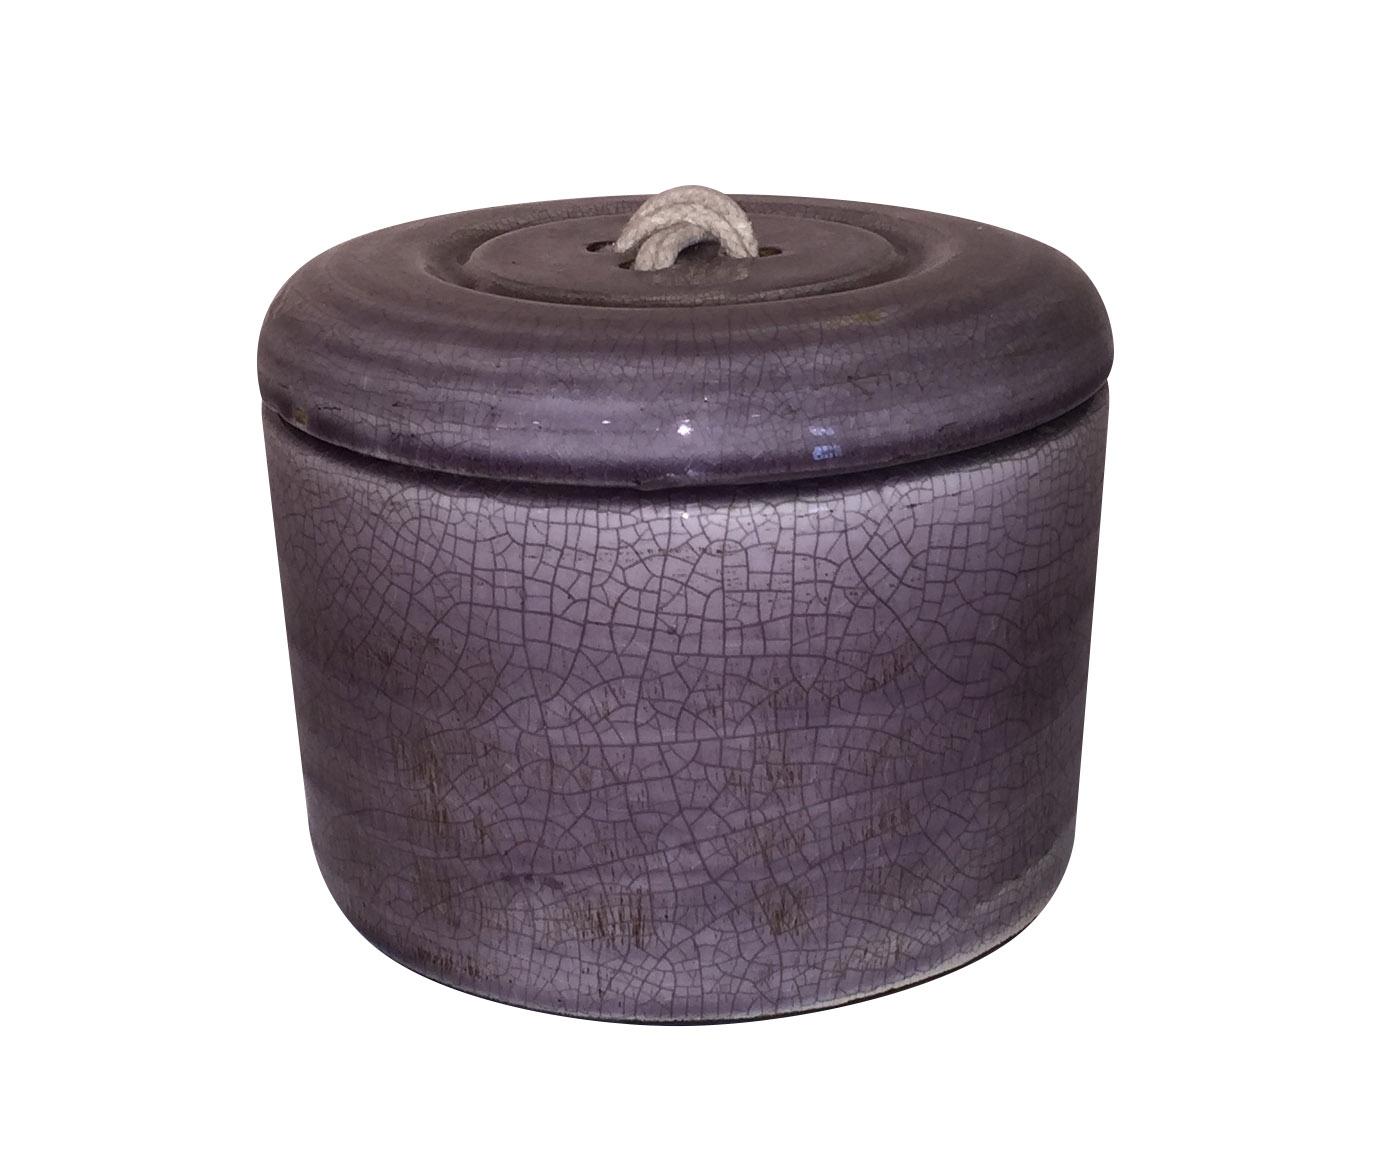 Ваза с крышкойЕмкости для хранения<br><br><br>Material: Керамика<br>Height см: 15,5<br>Diameter см: 21,5